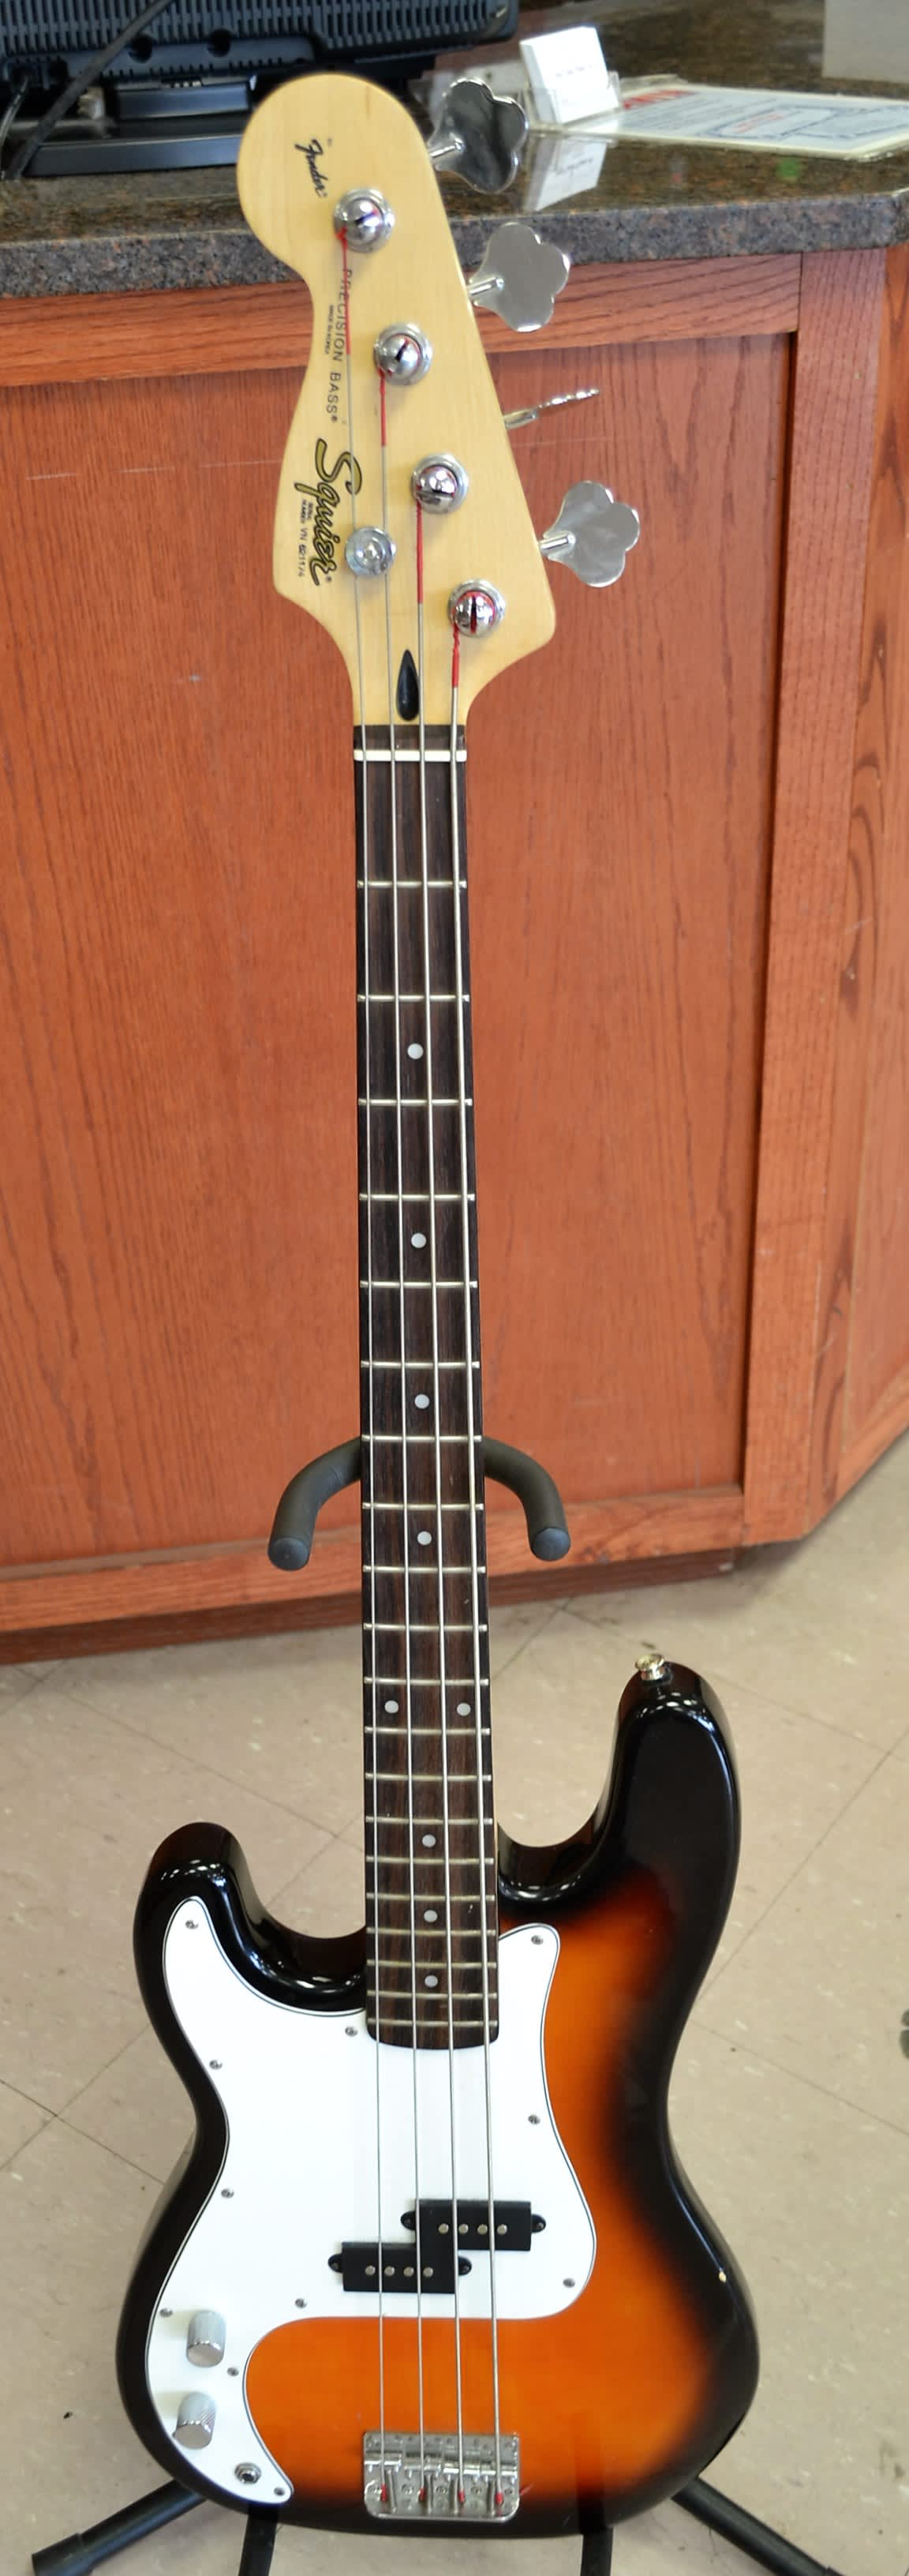 squier by fender p bass precision bass 4 string bass guitar reverb. Black Bedroom Furniture Sets. Home Design Ideas